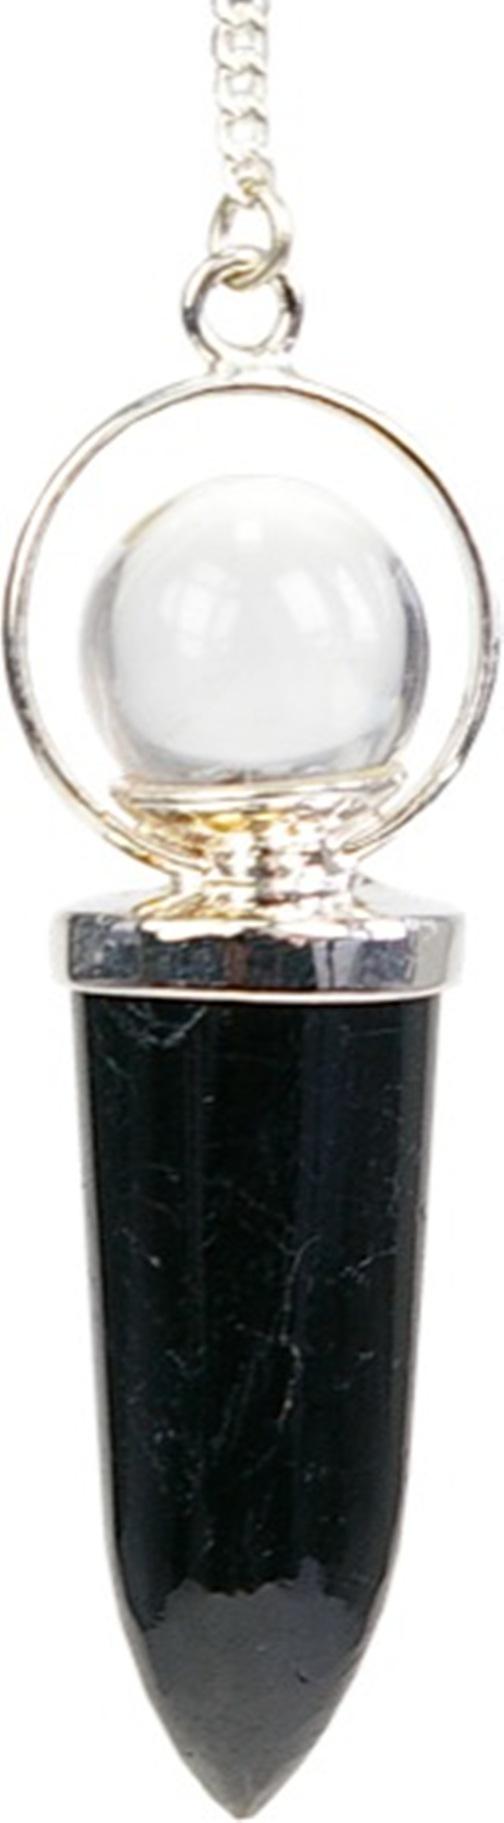 Pendule Tourmaline Noire avec Bille de cristal